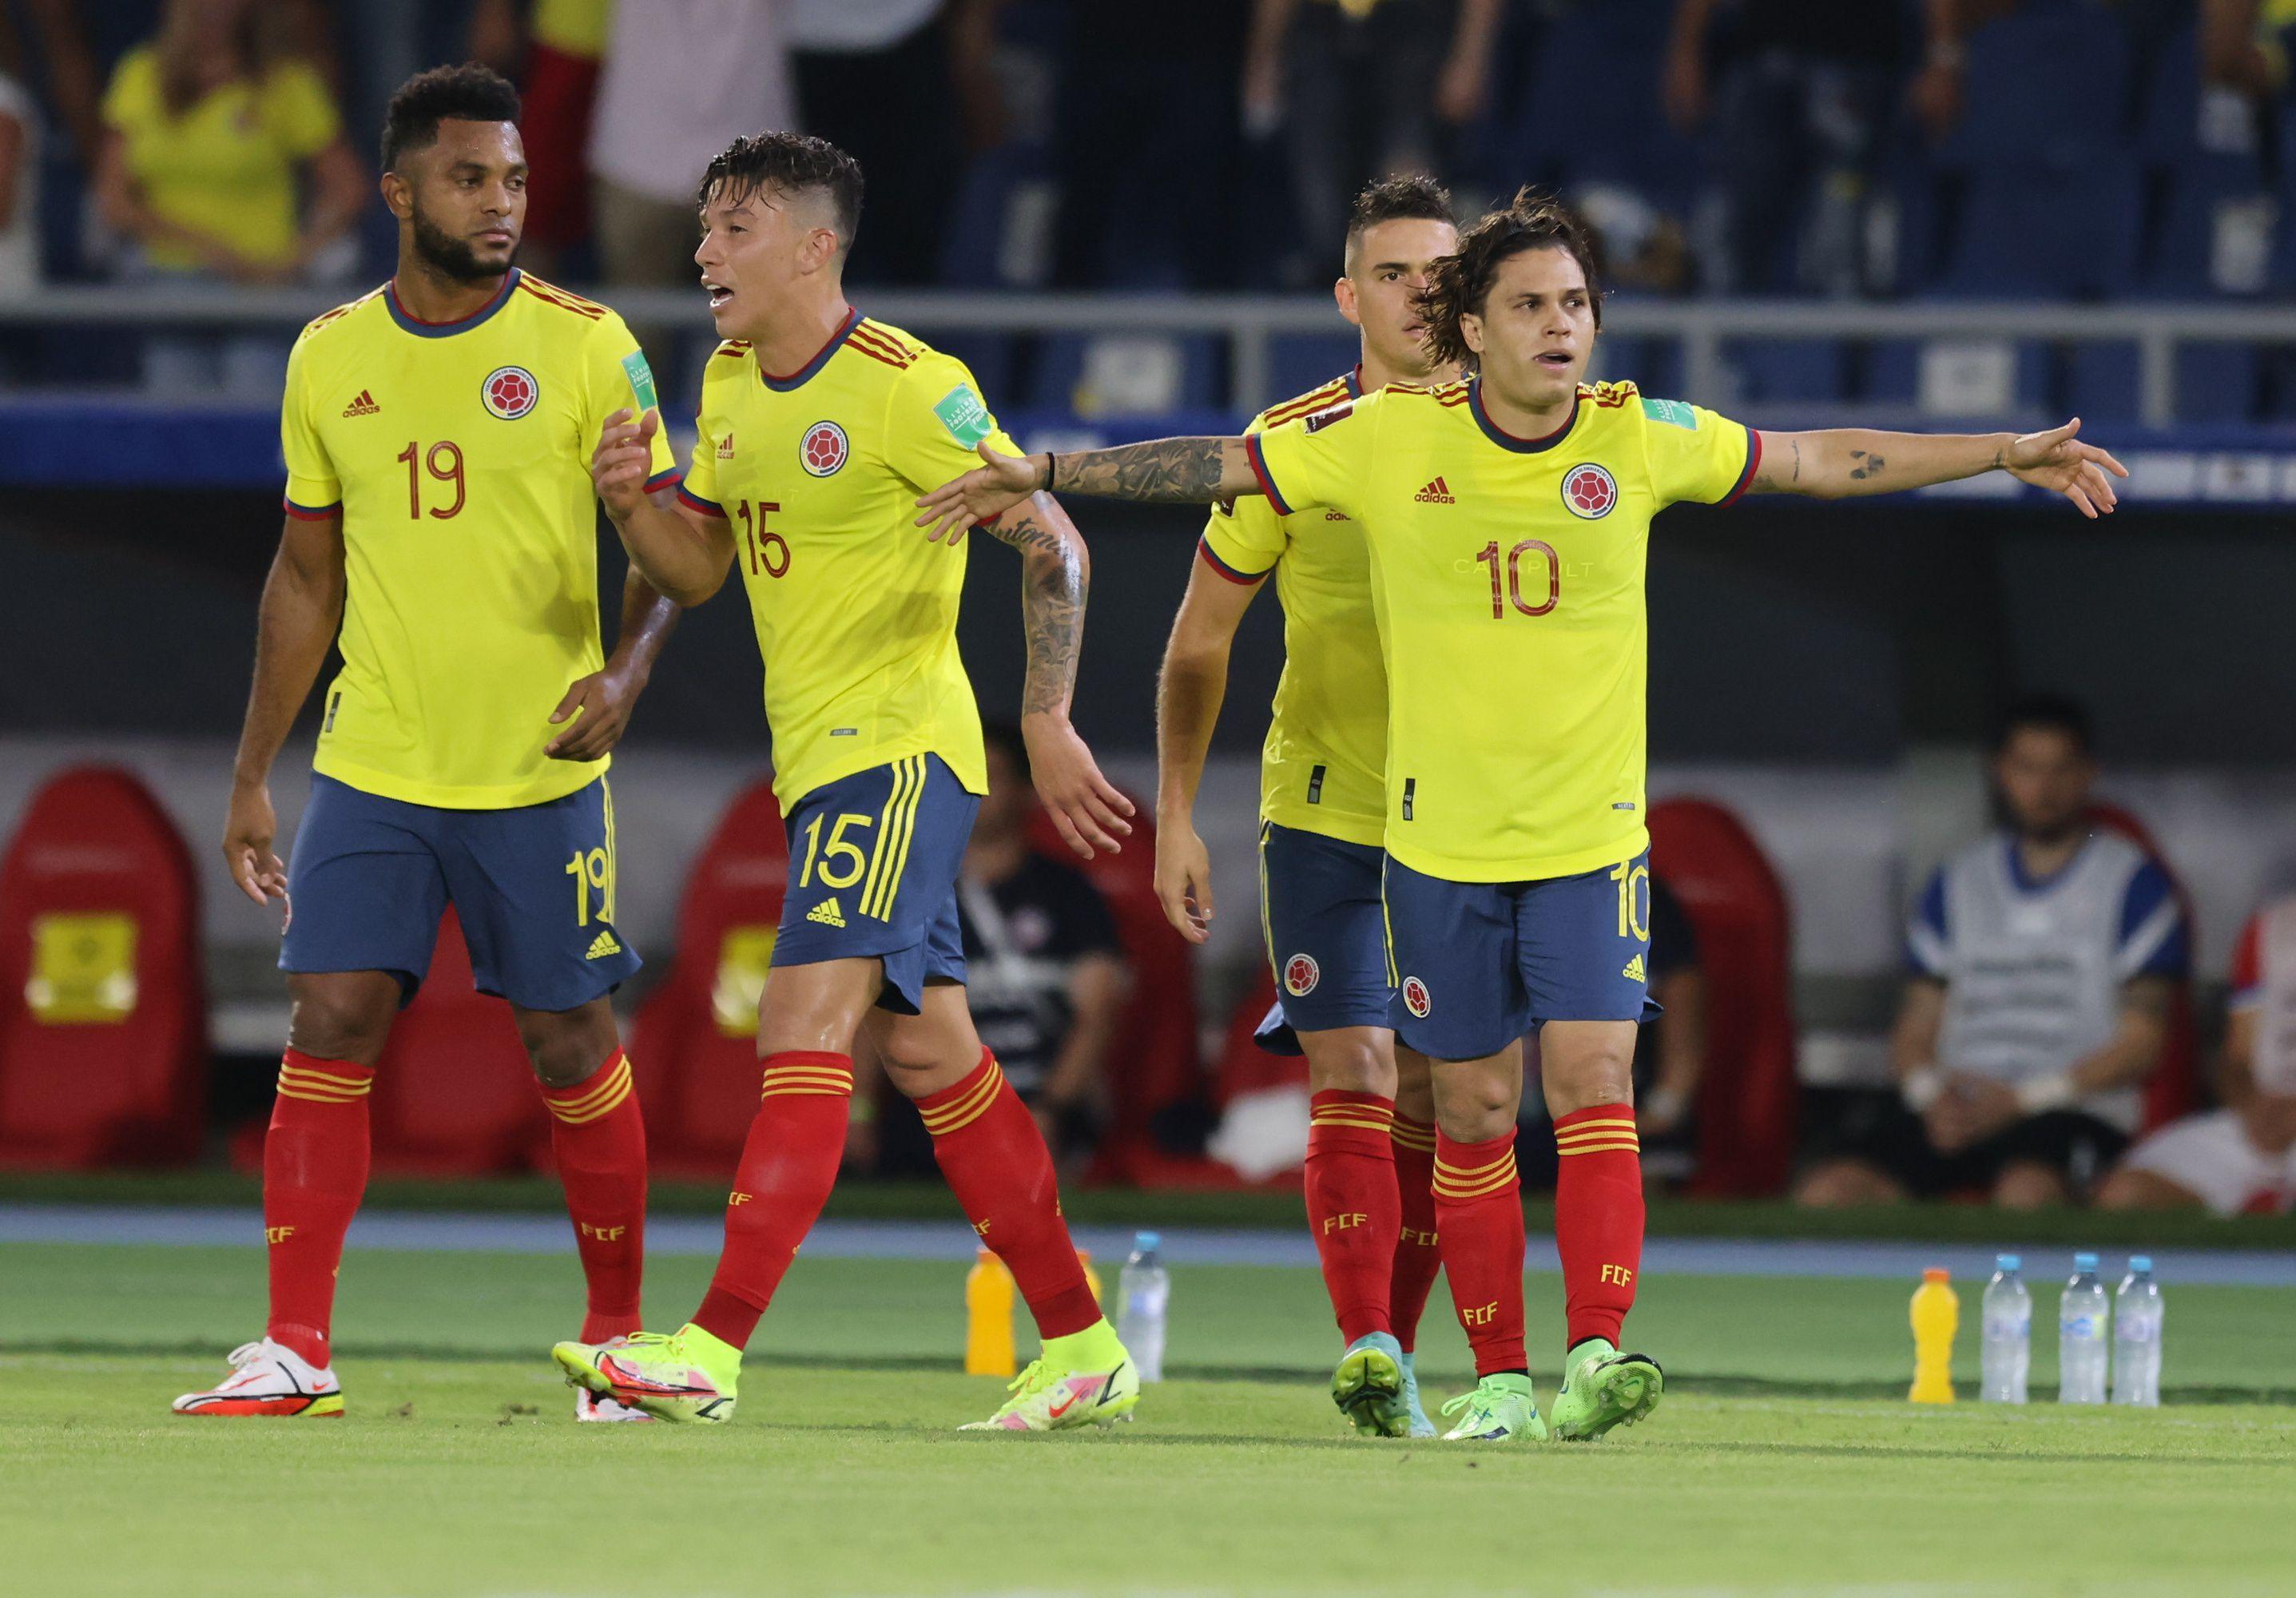 Juan Fernando Quintero (right) in the 3-1 victory against Chile at the Estadio Metropolitano de Barranquilla.  Photo: REUTERS / Luisa Gonzalez